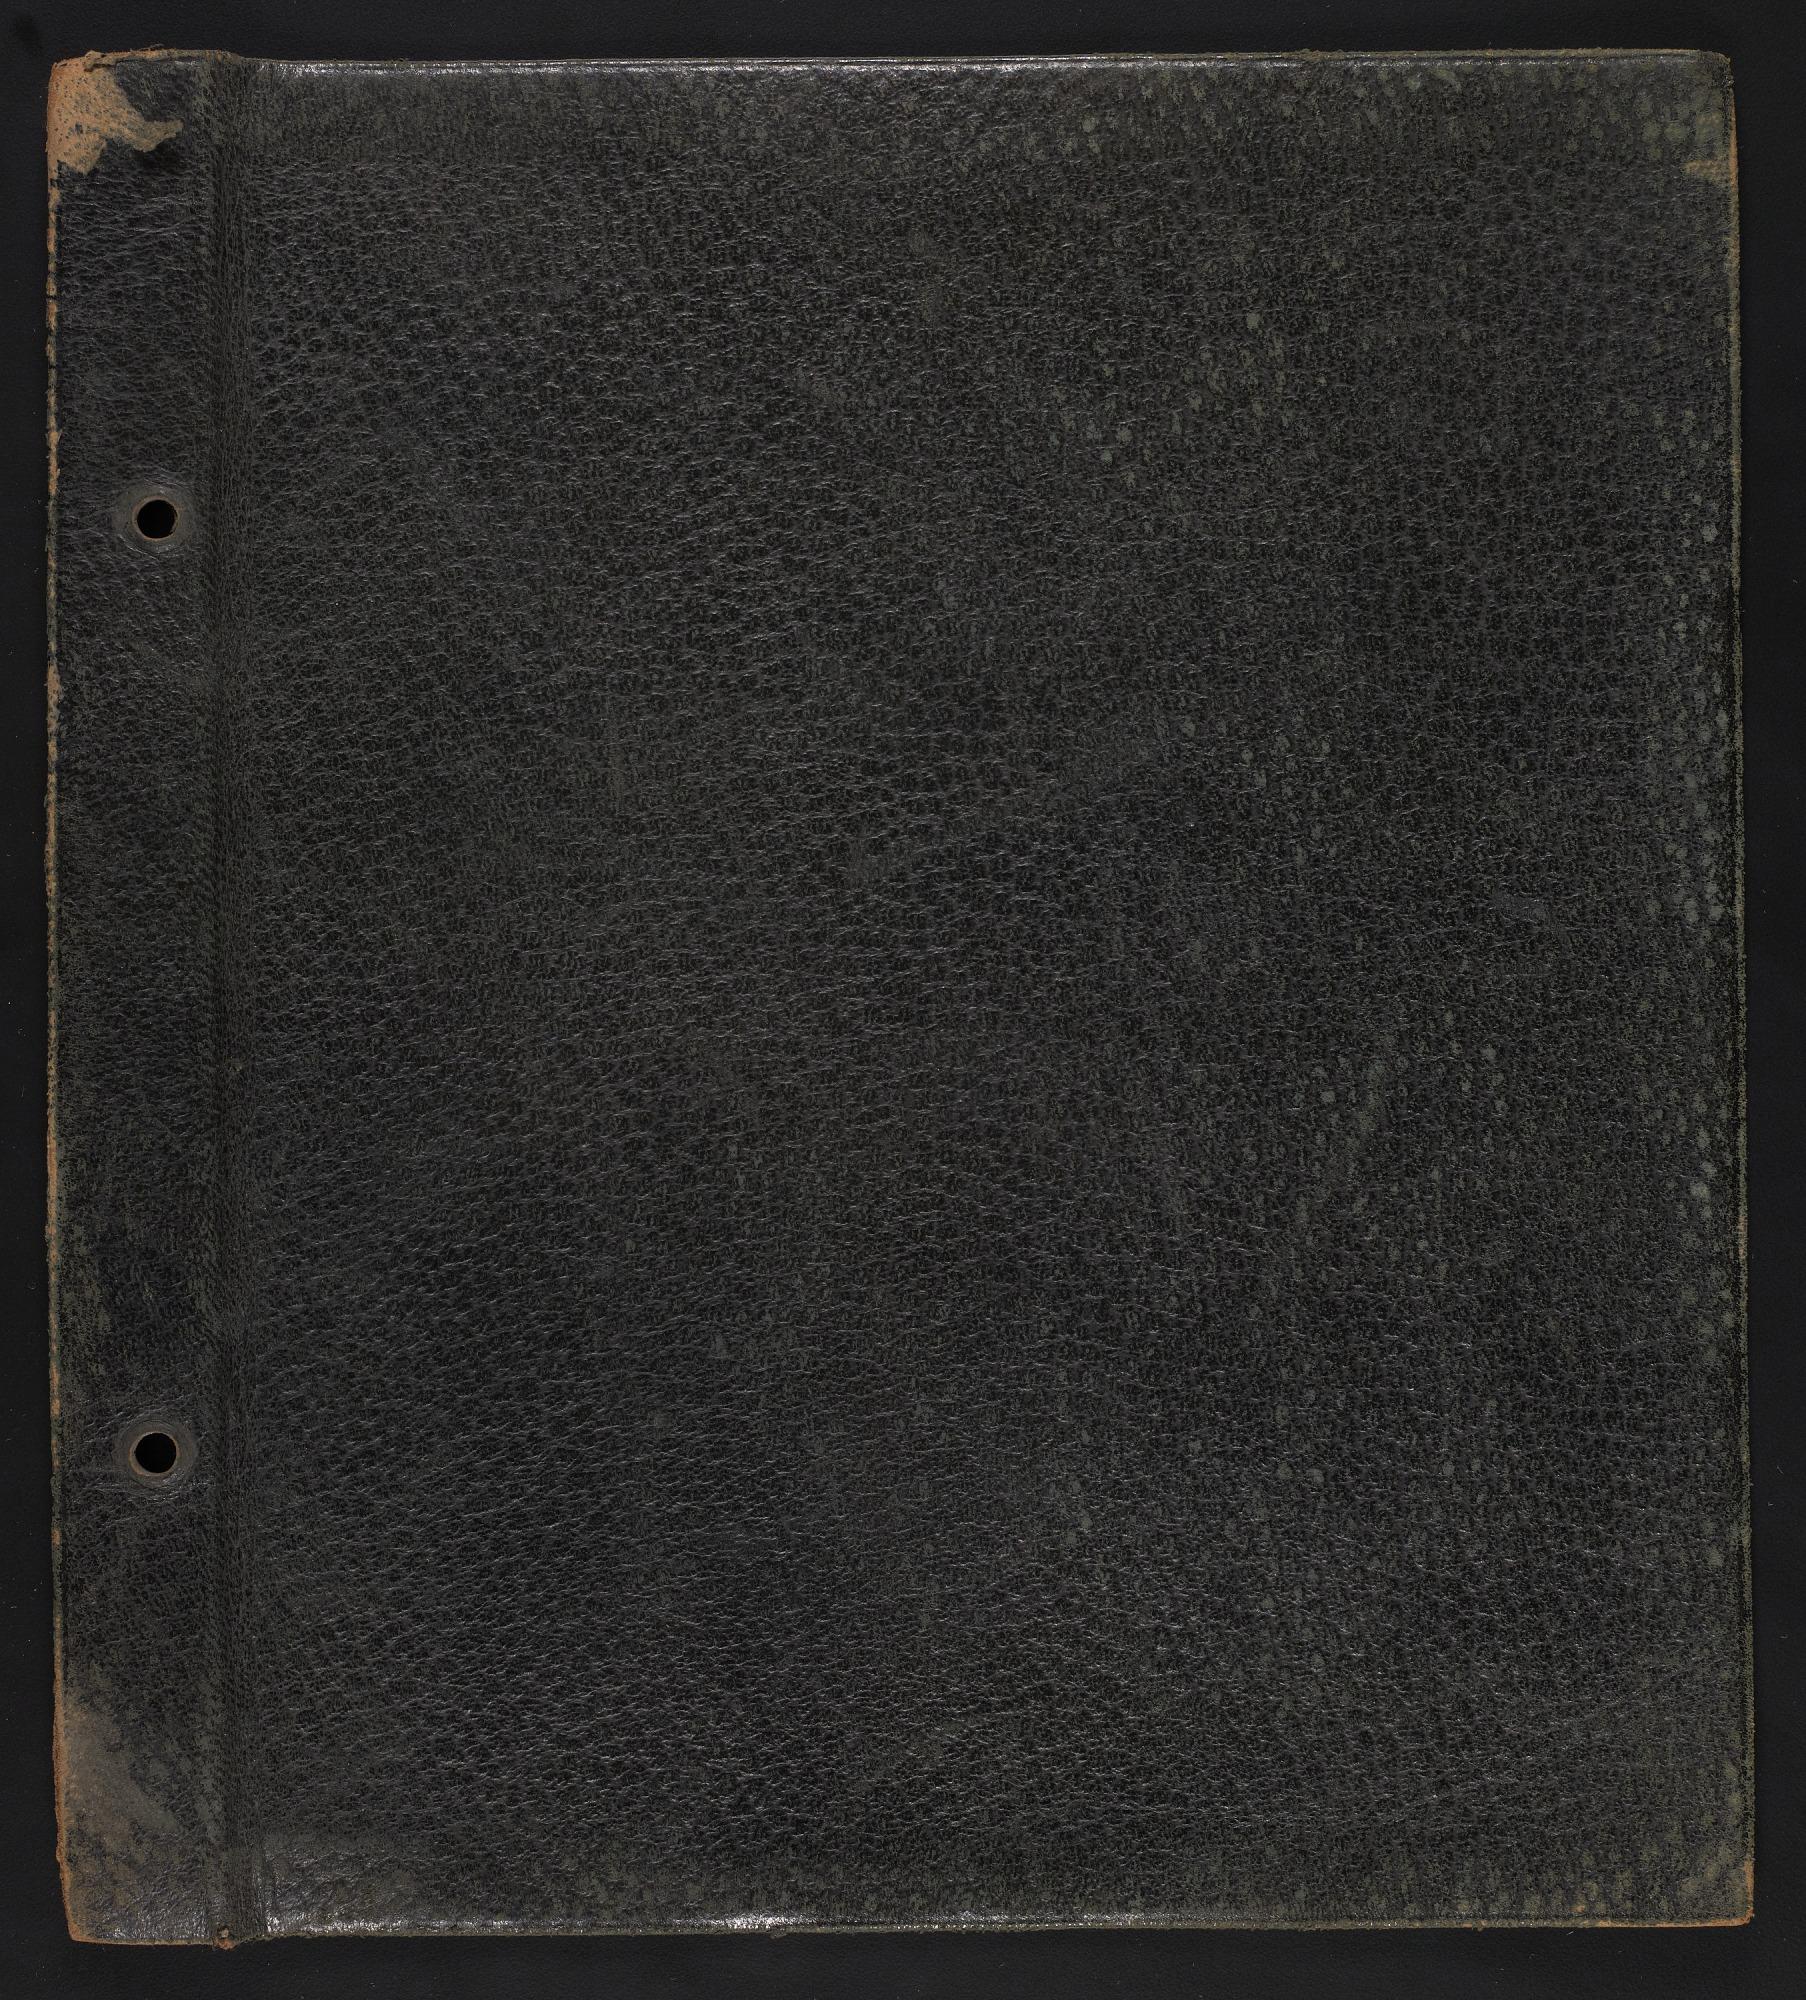 Haiti, 1912, 1912-1913, Smithsonian Field Book Project, SIA RU007293.